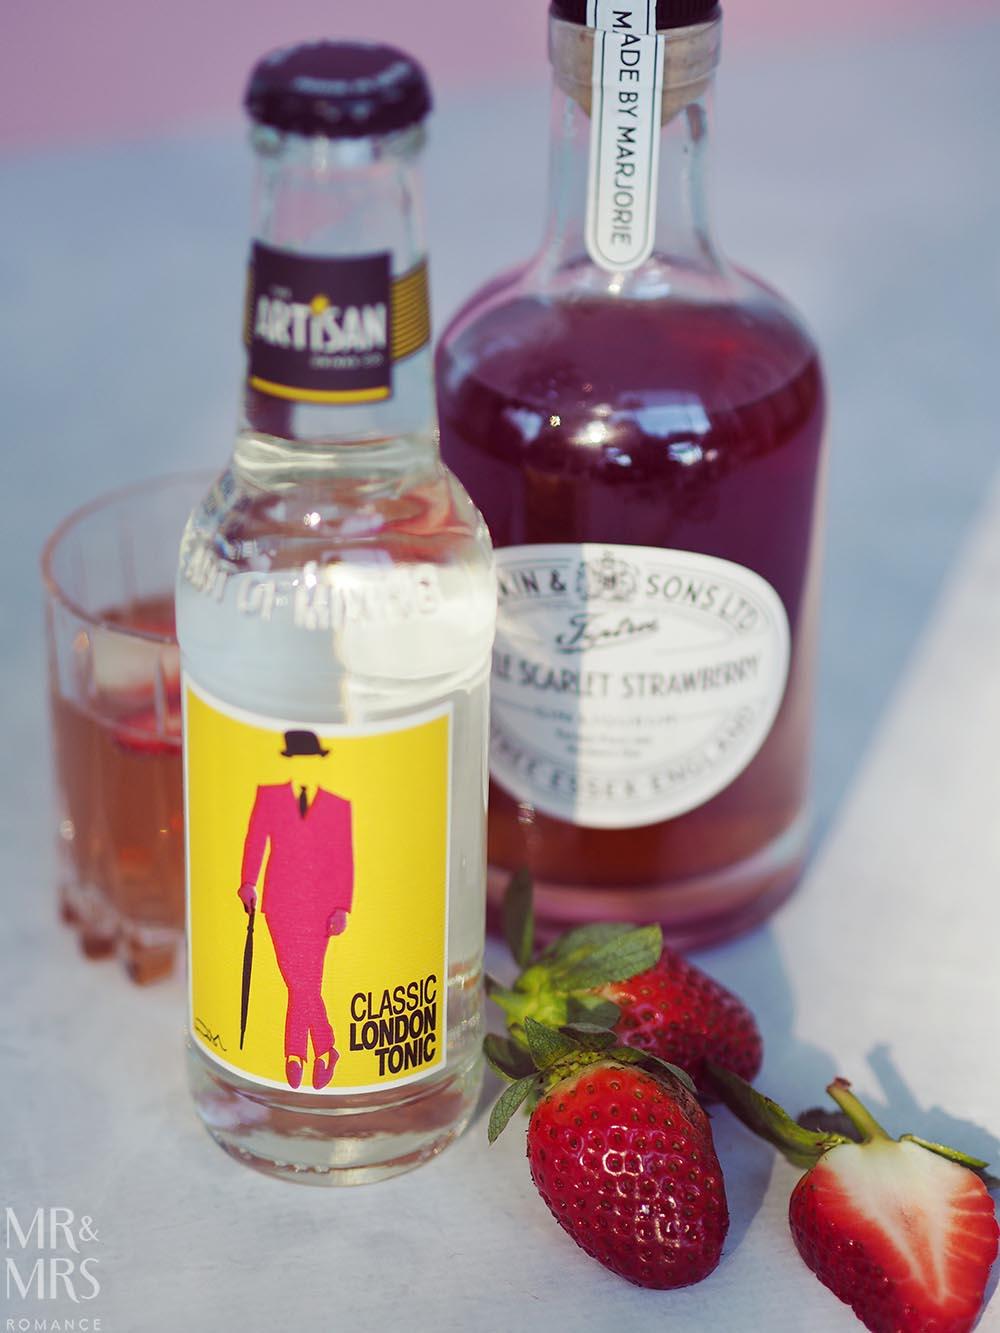 Wilkin Estates Tiptree Jam Co - Little Scarlet strawberry gin liqueur - Artisan Drinks Co tonic